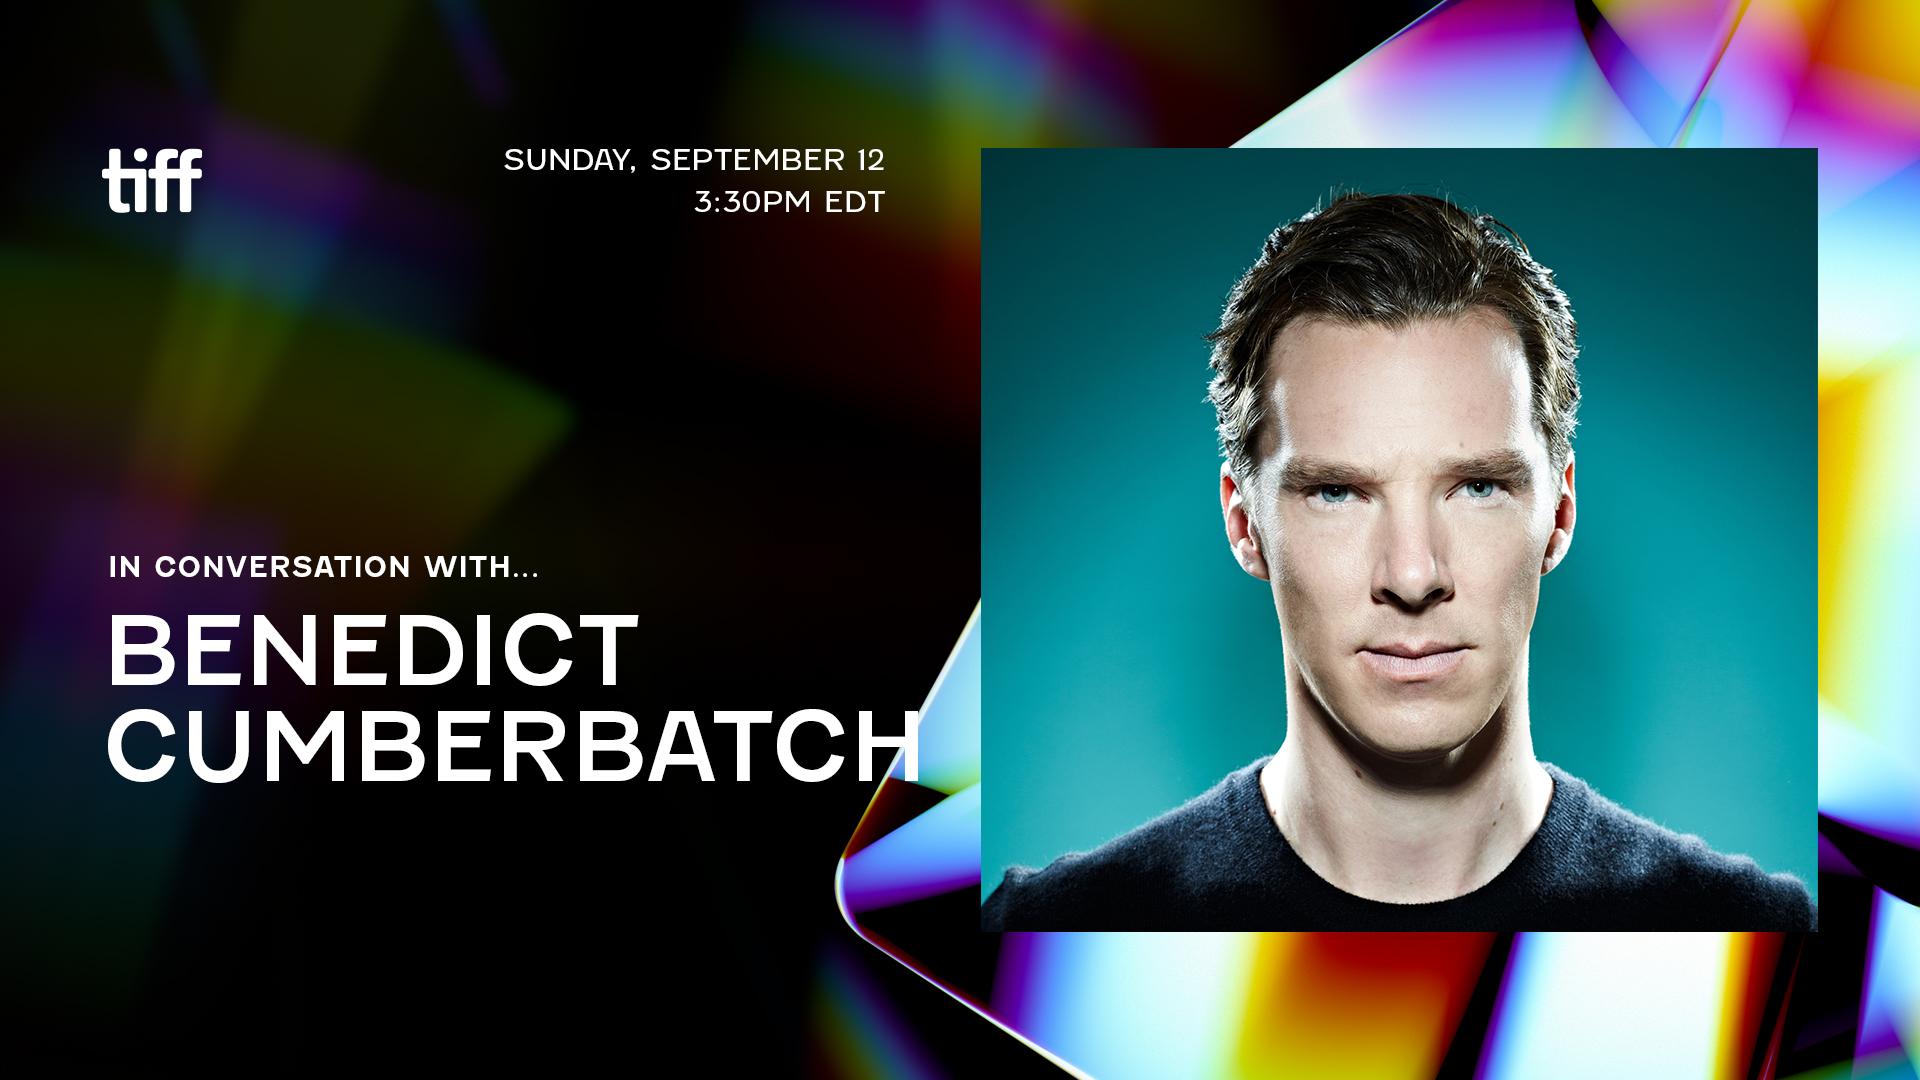 Headshot of Benedict Cumberbatch